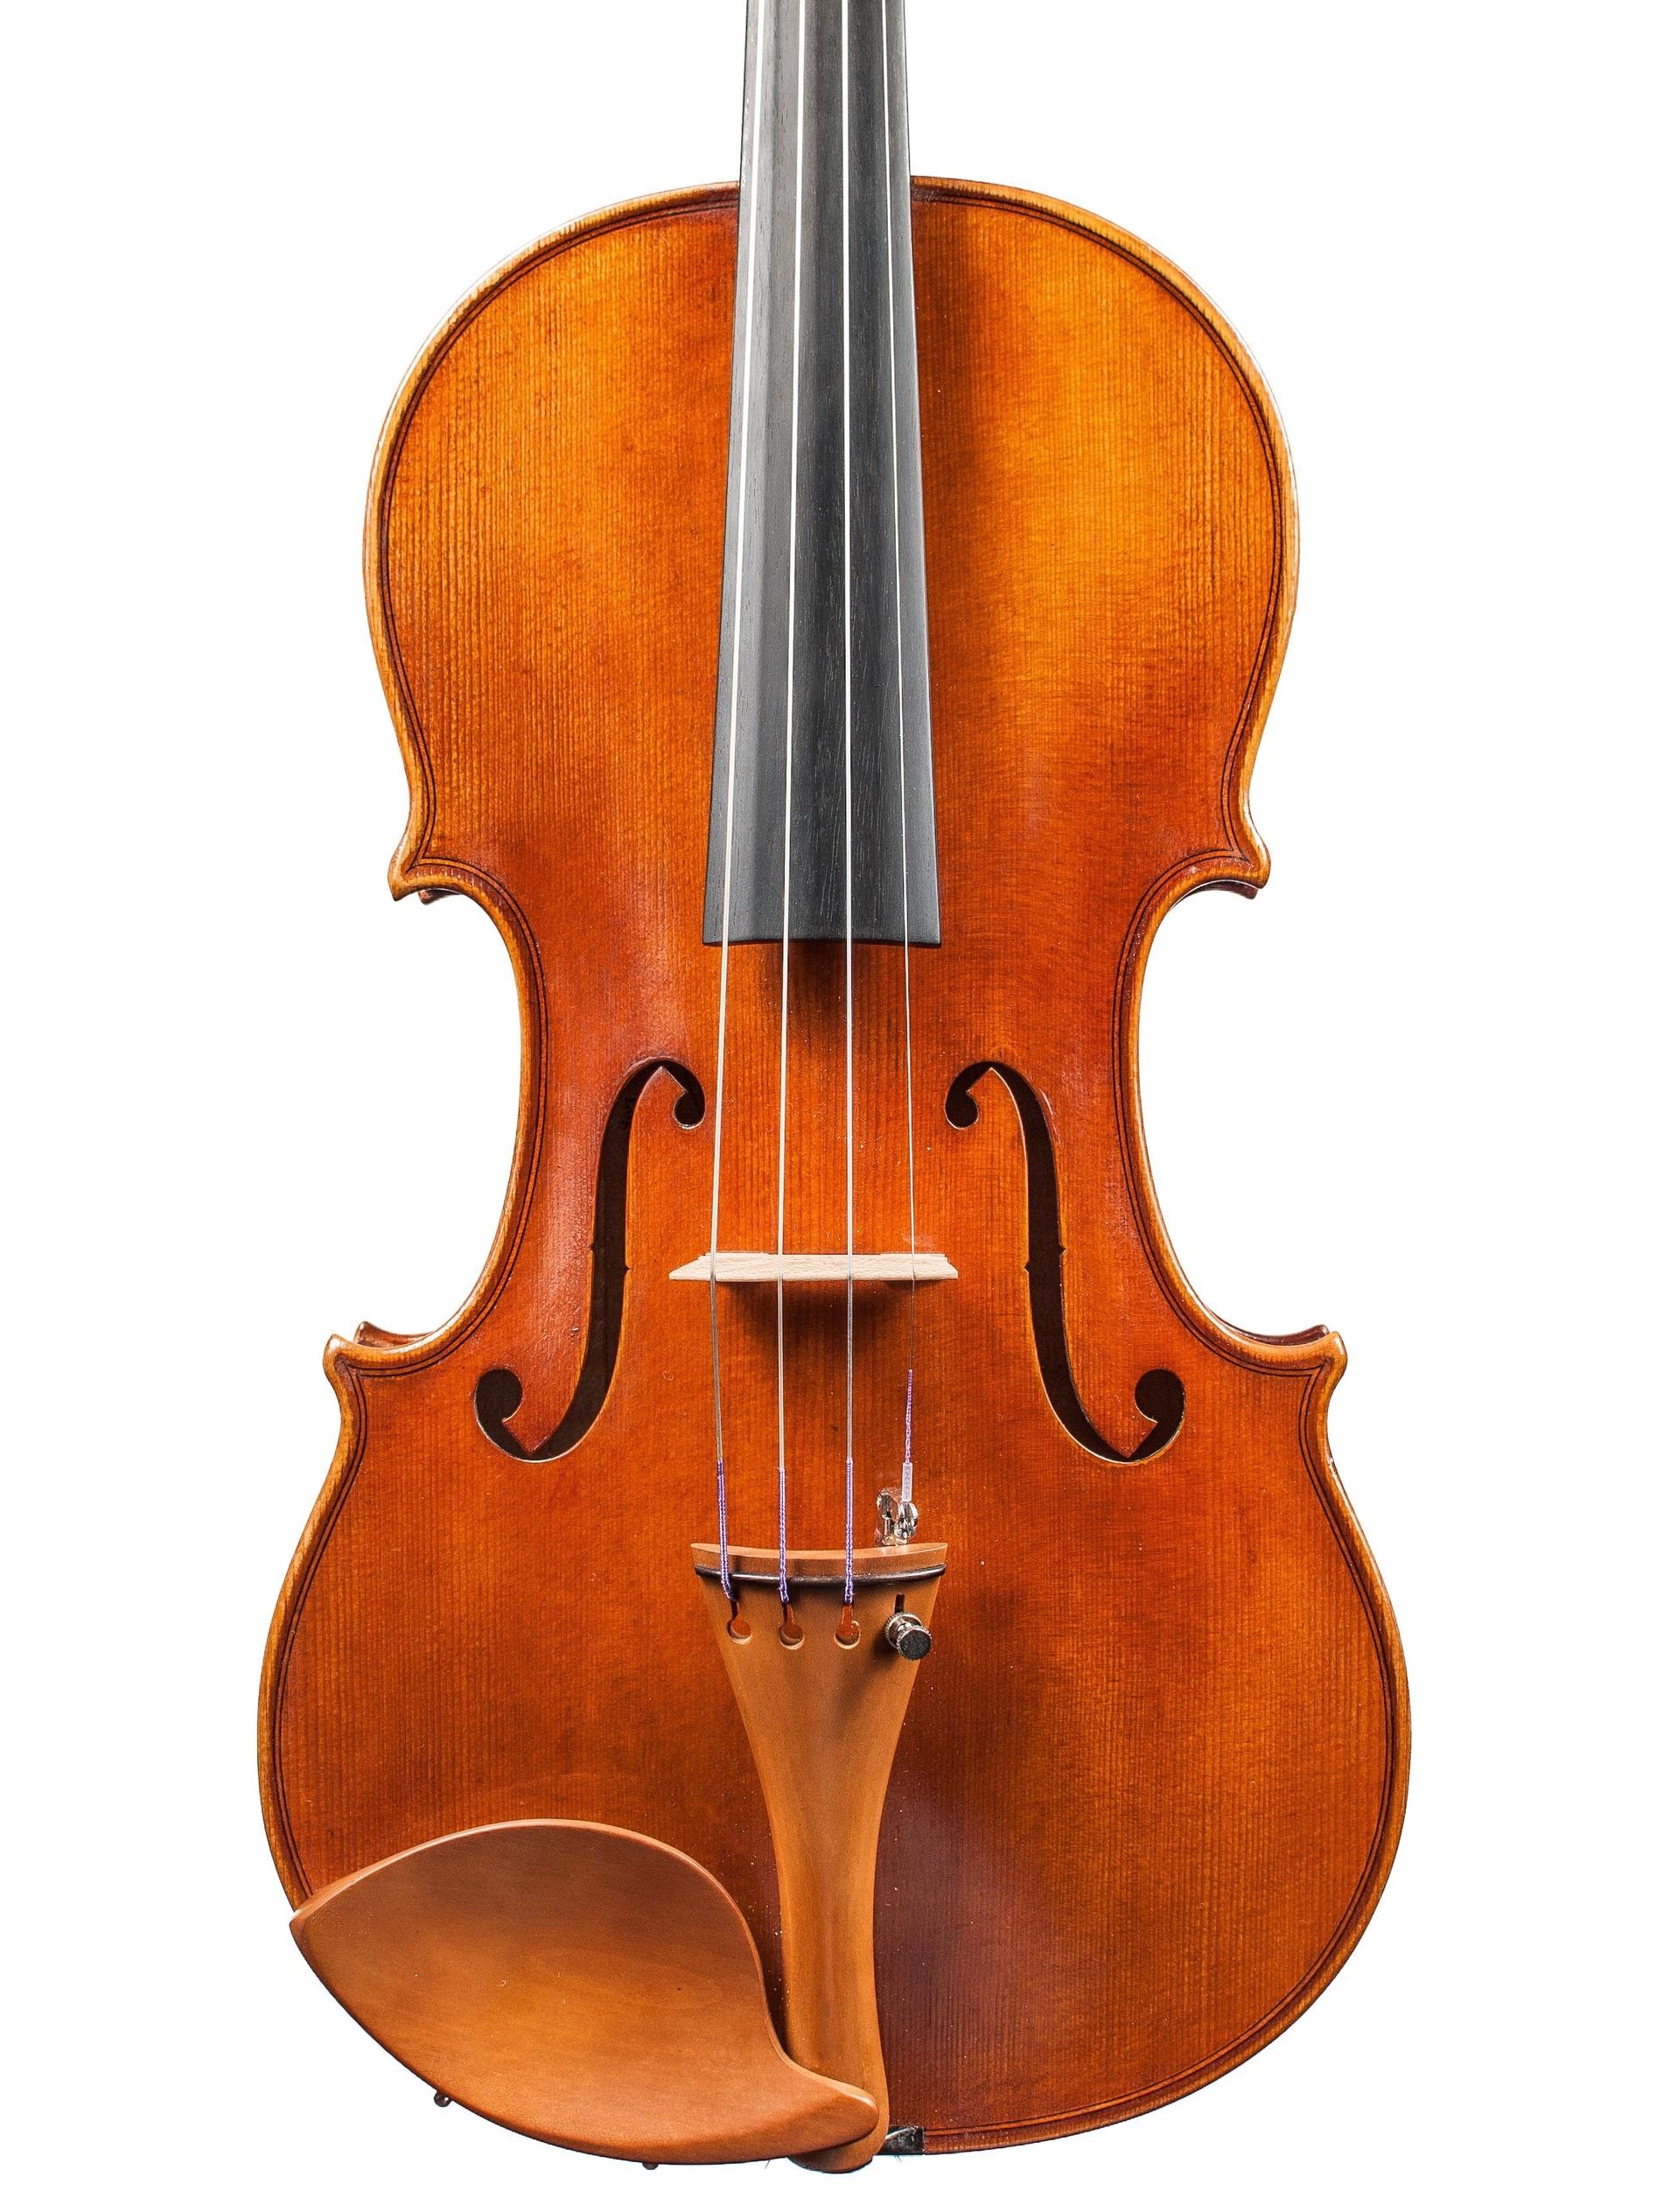 Violin by Atelier Edgar Russ Linea Macchi, 2019